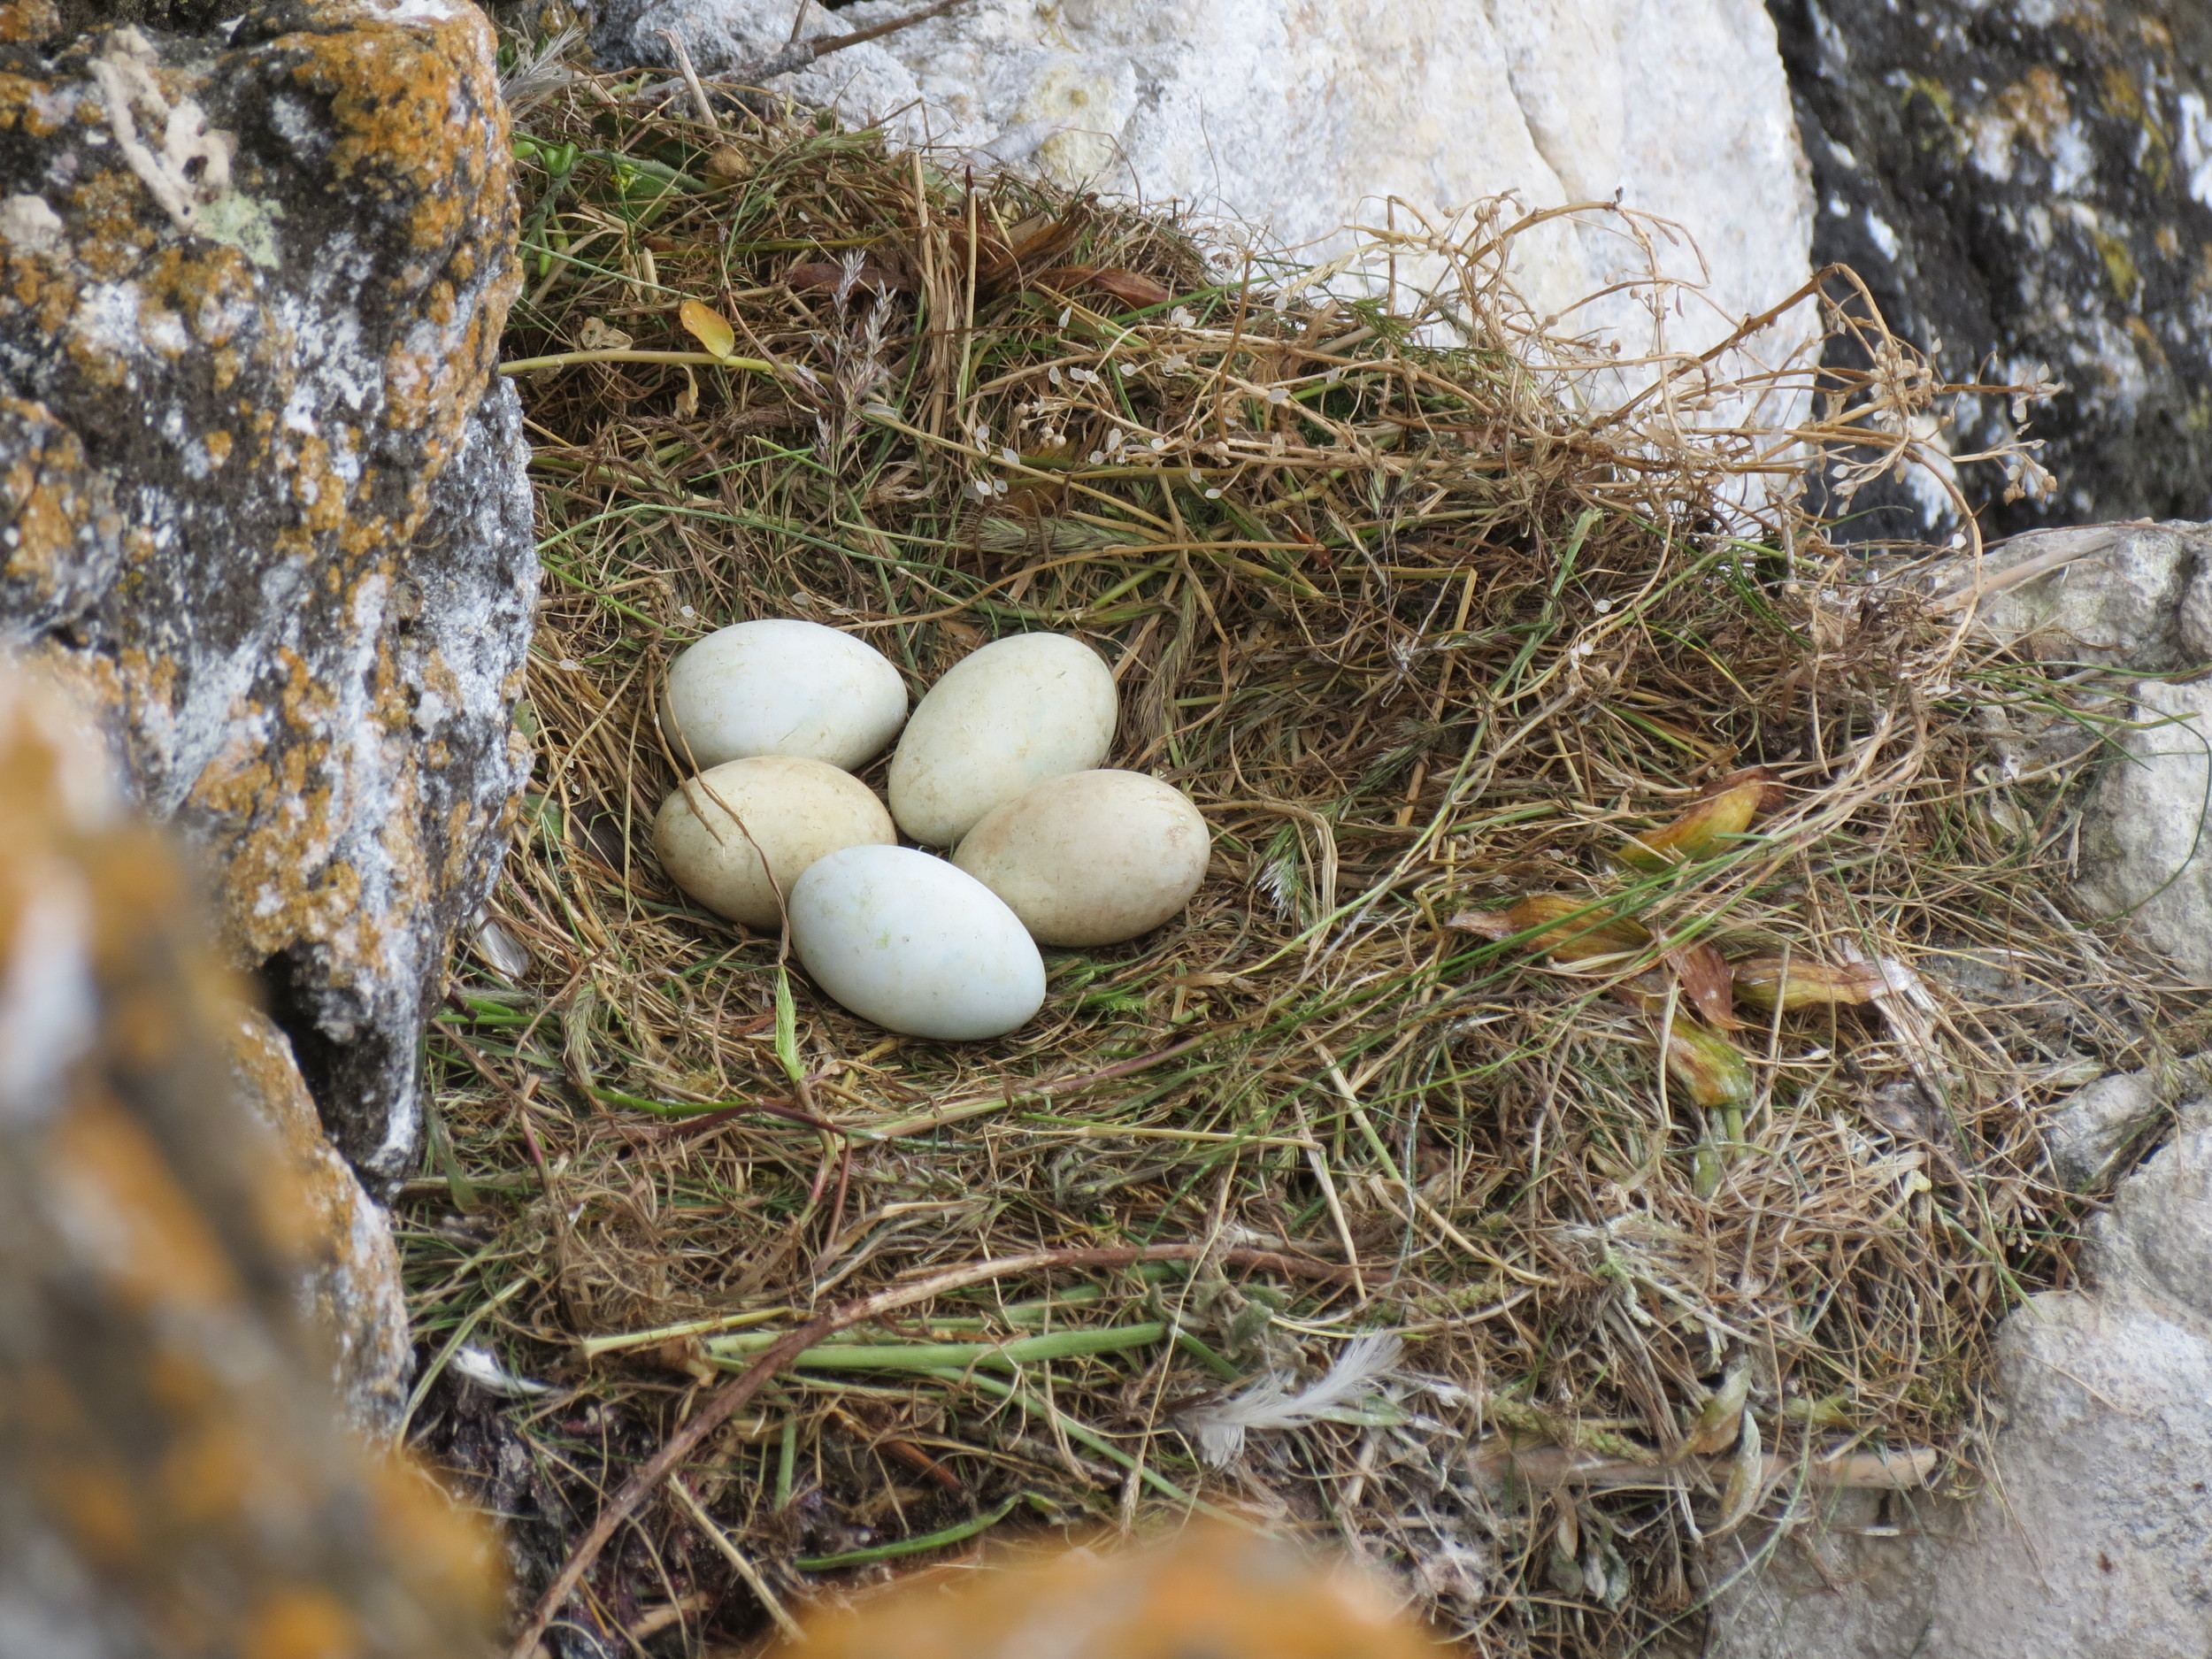 Pelagic Cormorant Nest - with eggs Lost Island.JPG